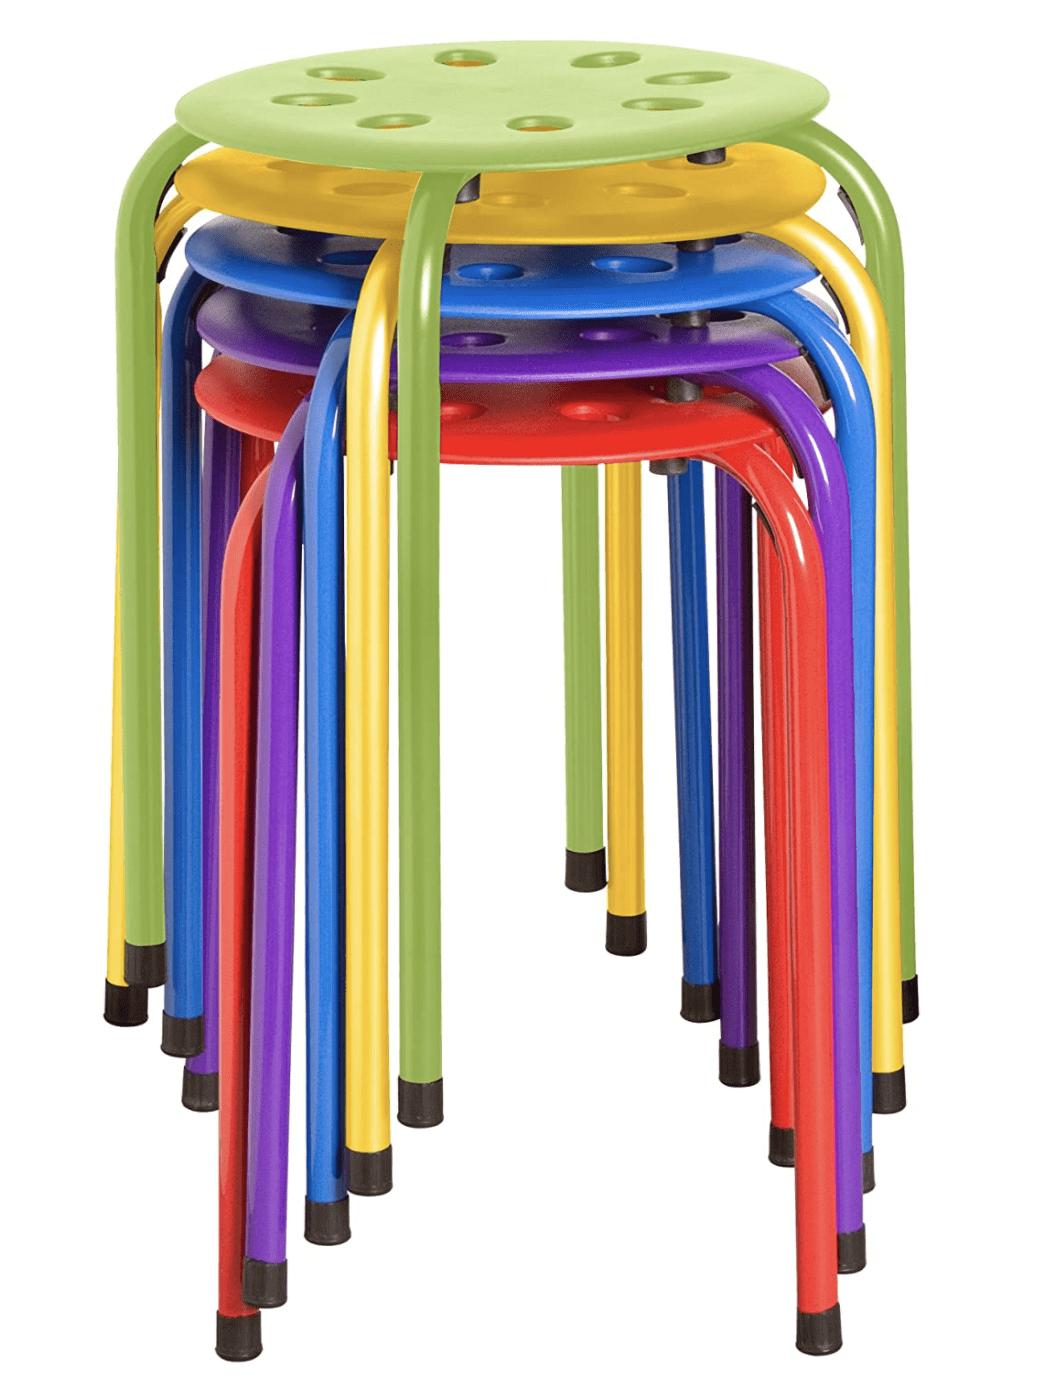 Flexible Seating Stools